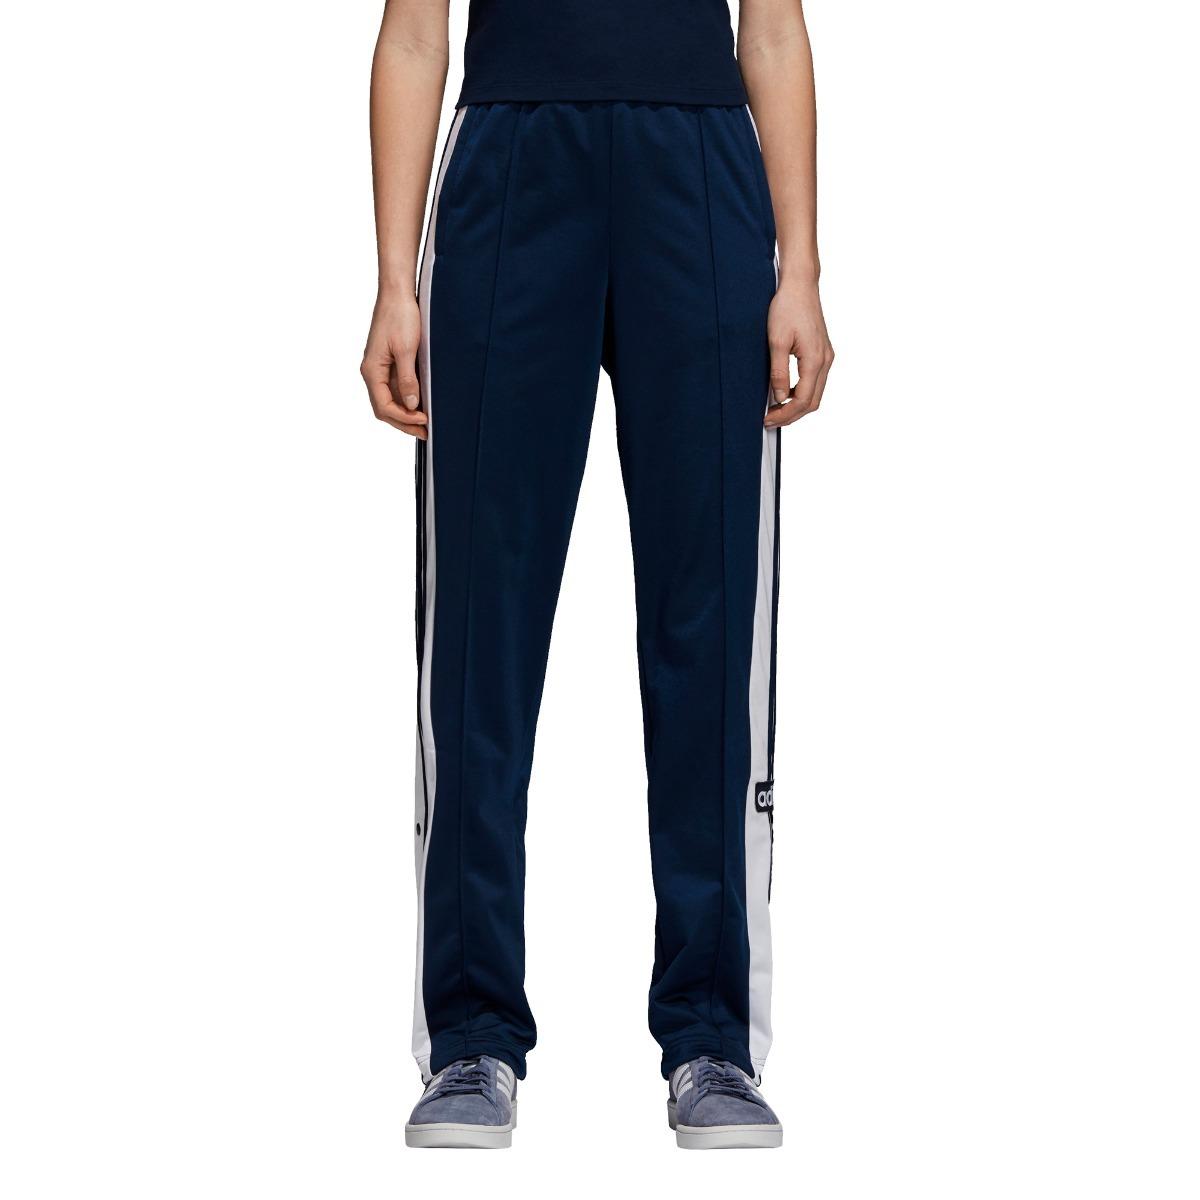 En Pantalón Mujer Azul Adidas Originals 799 2 Adibreak 00 HqHgBf1